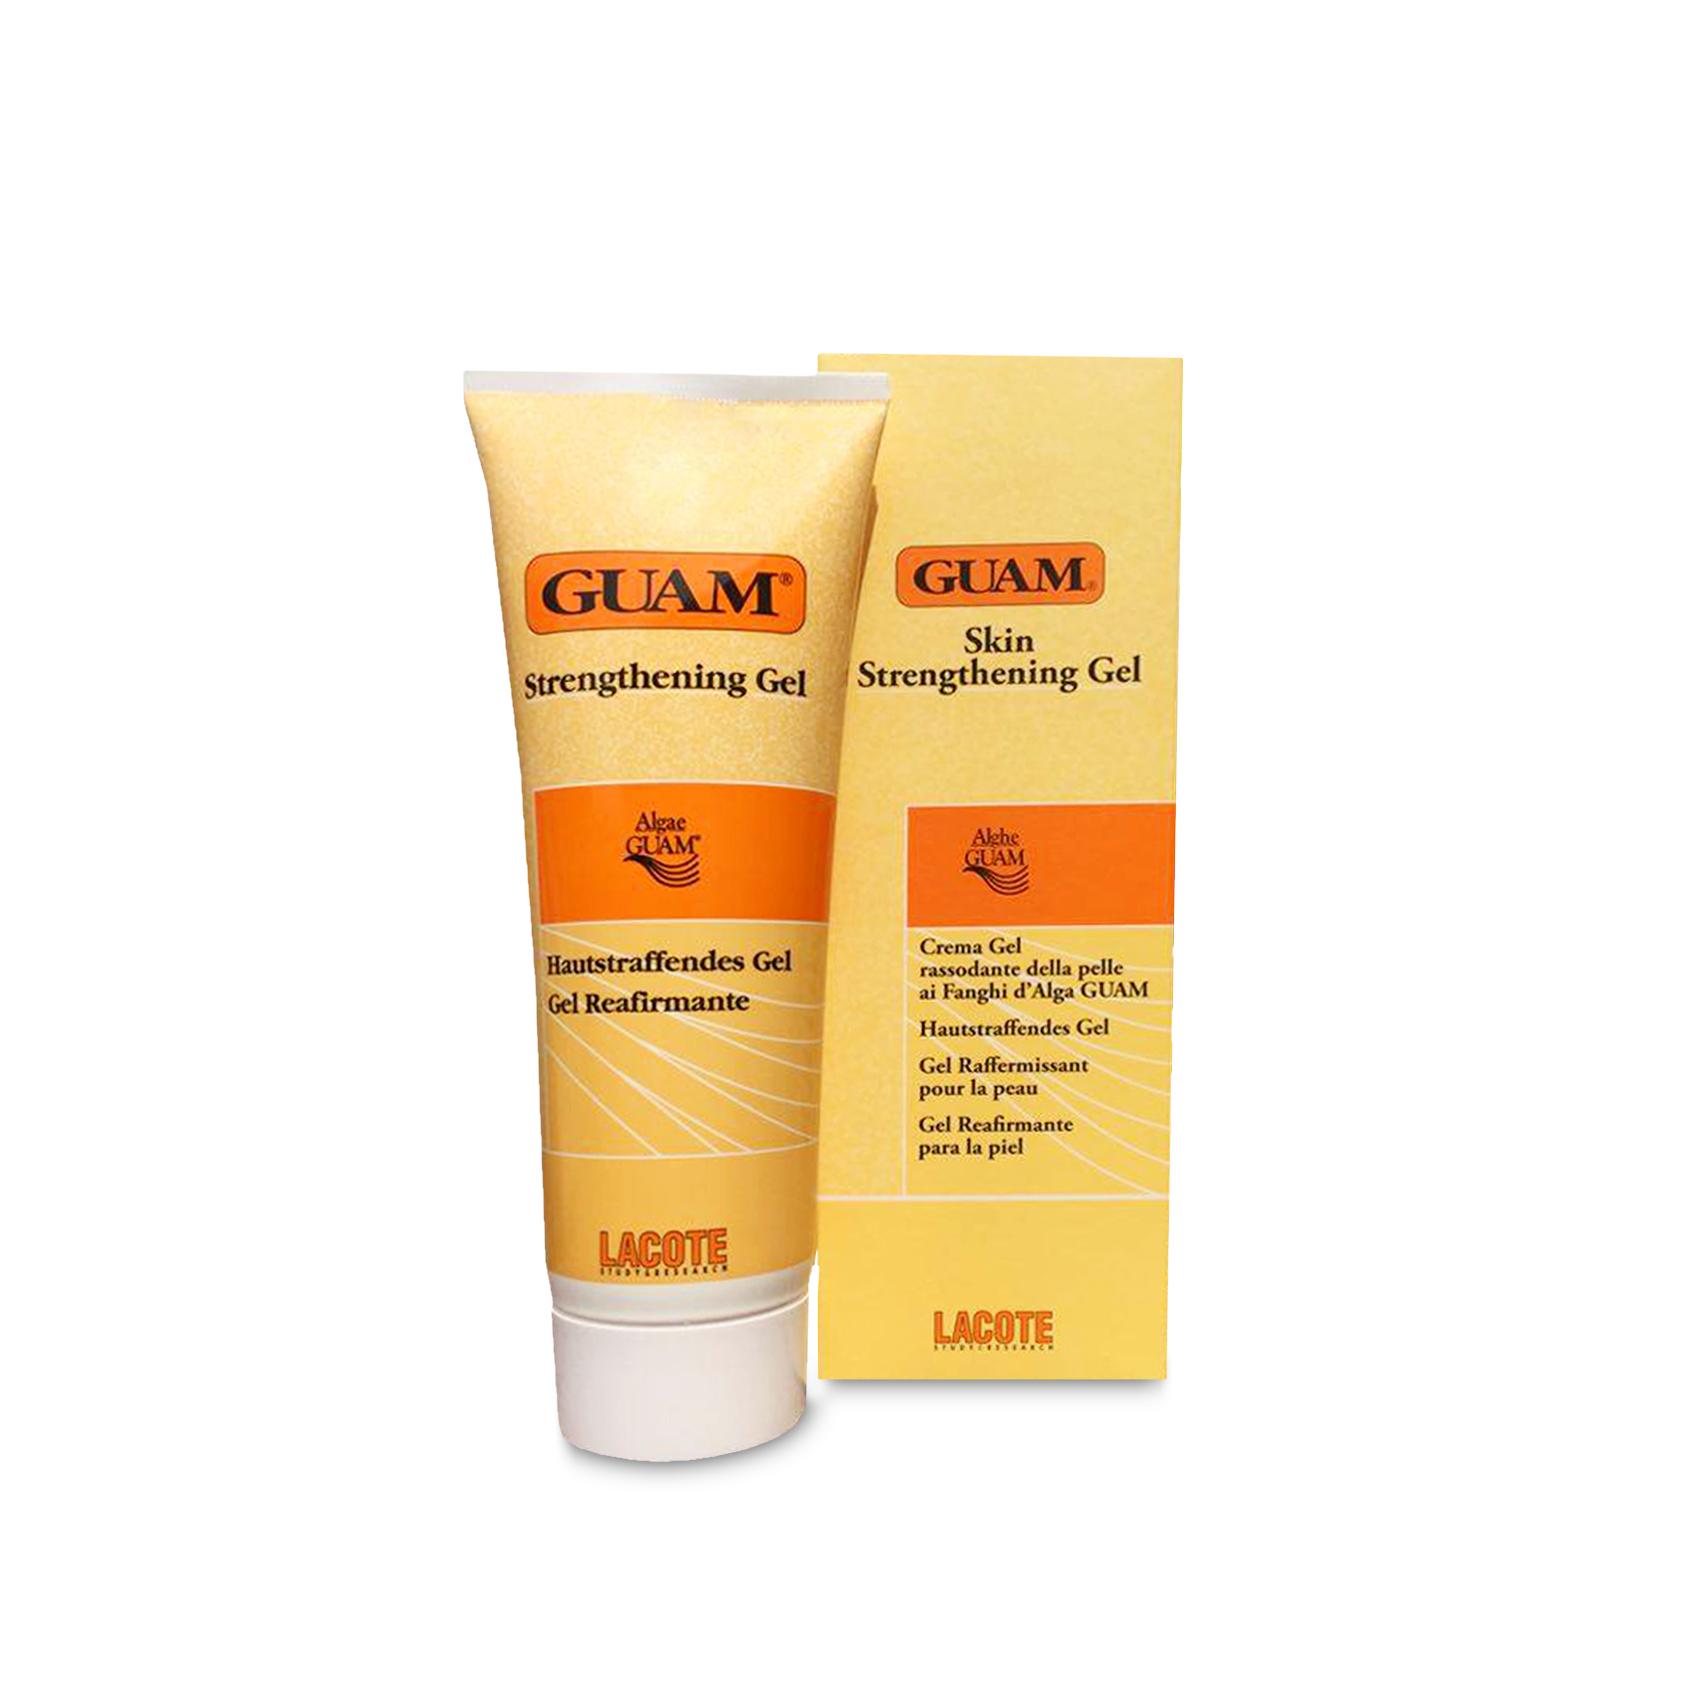 Guam gel 250 ml